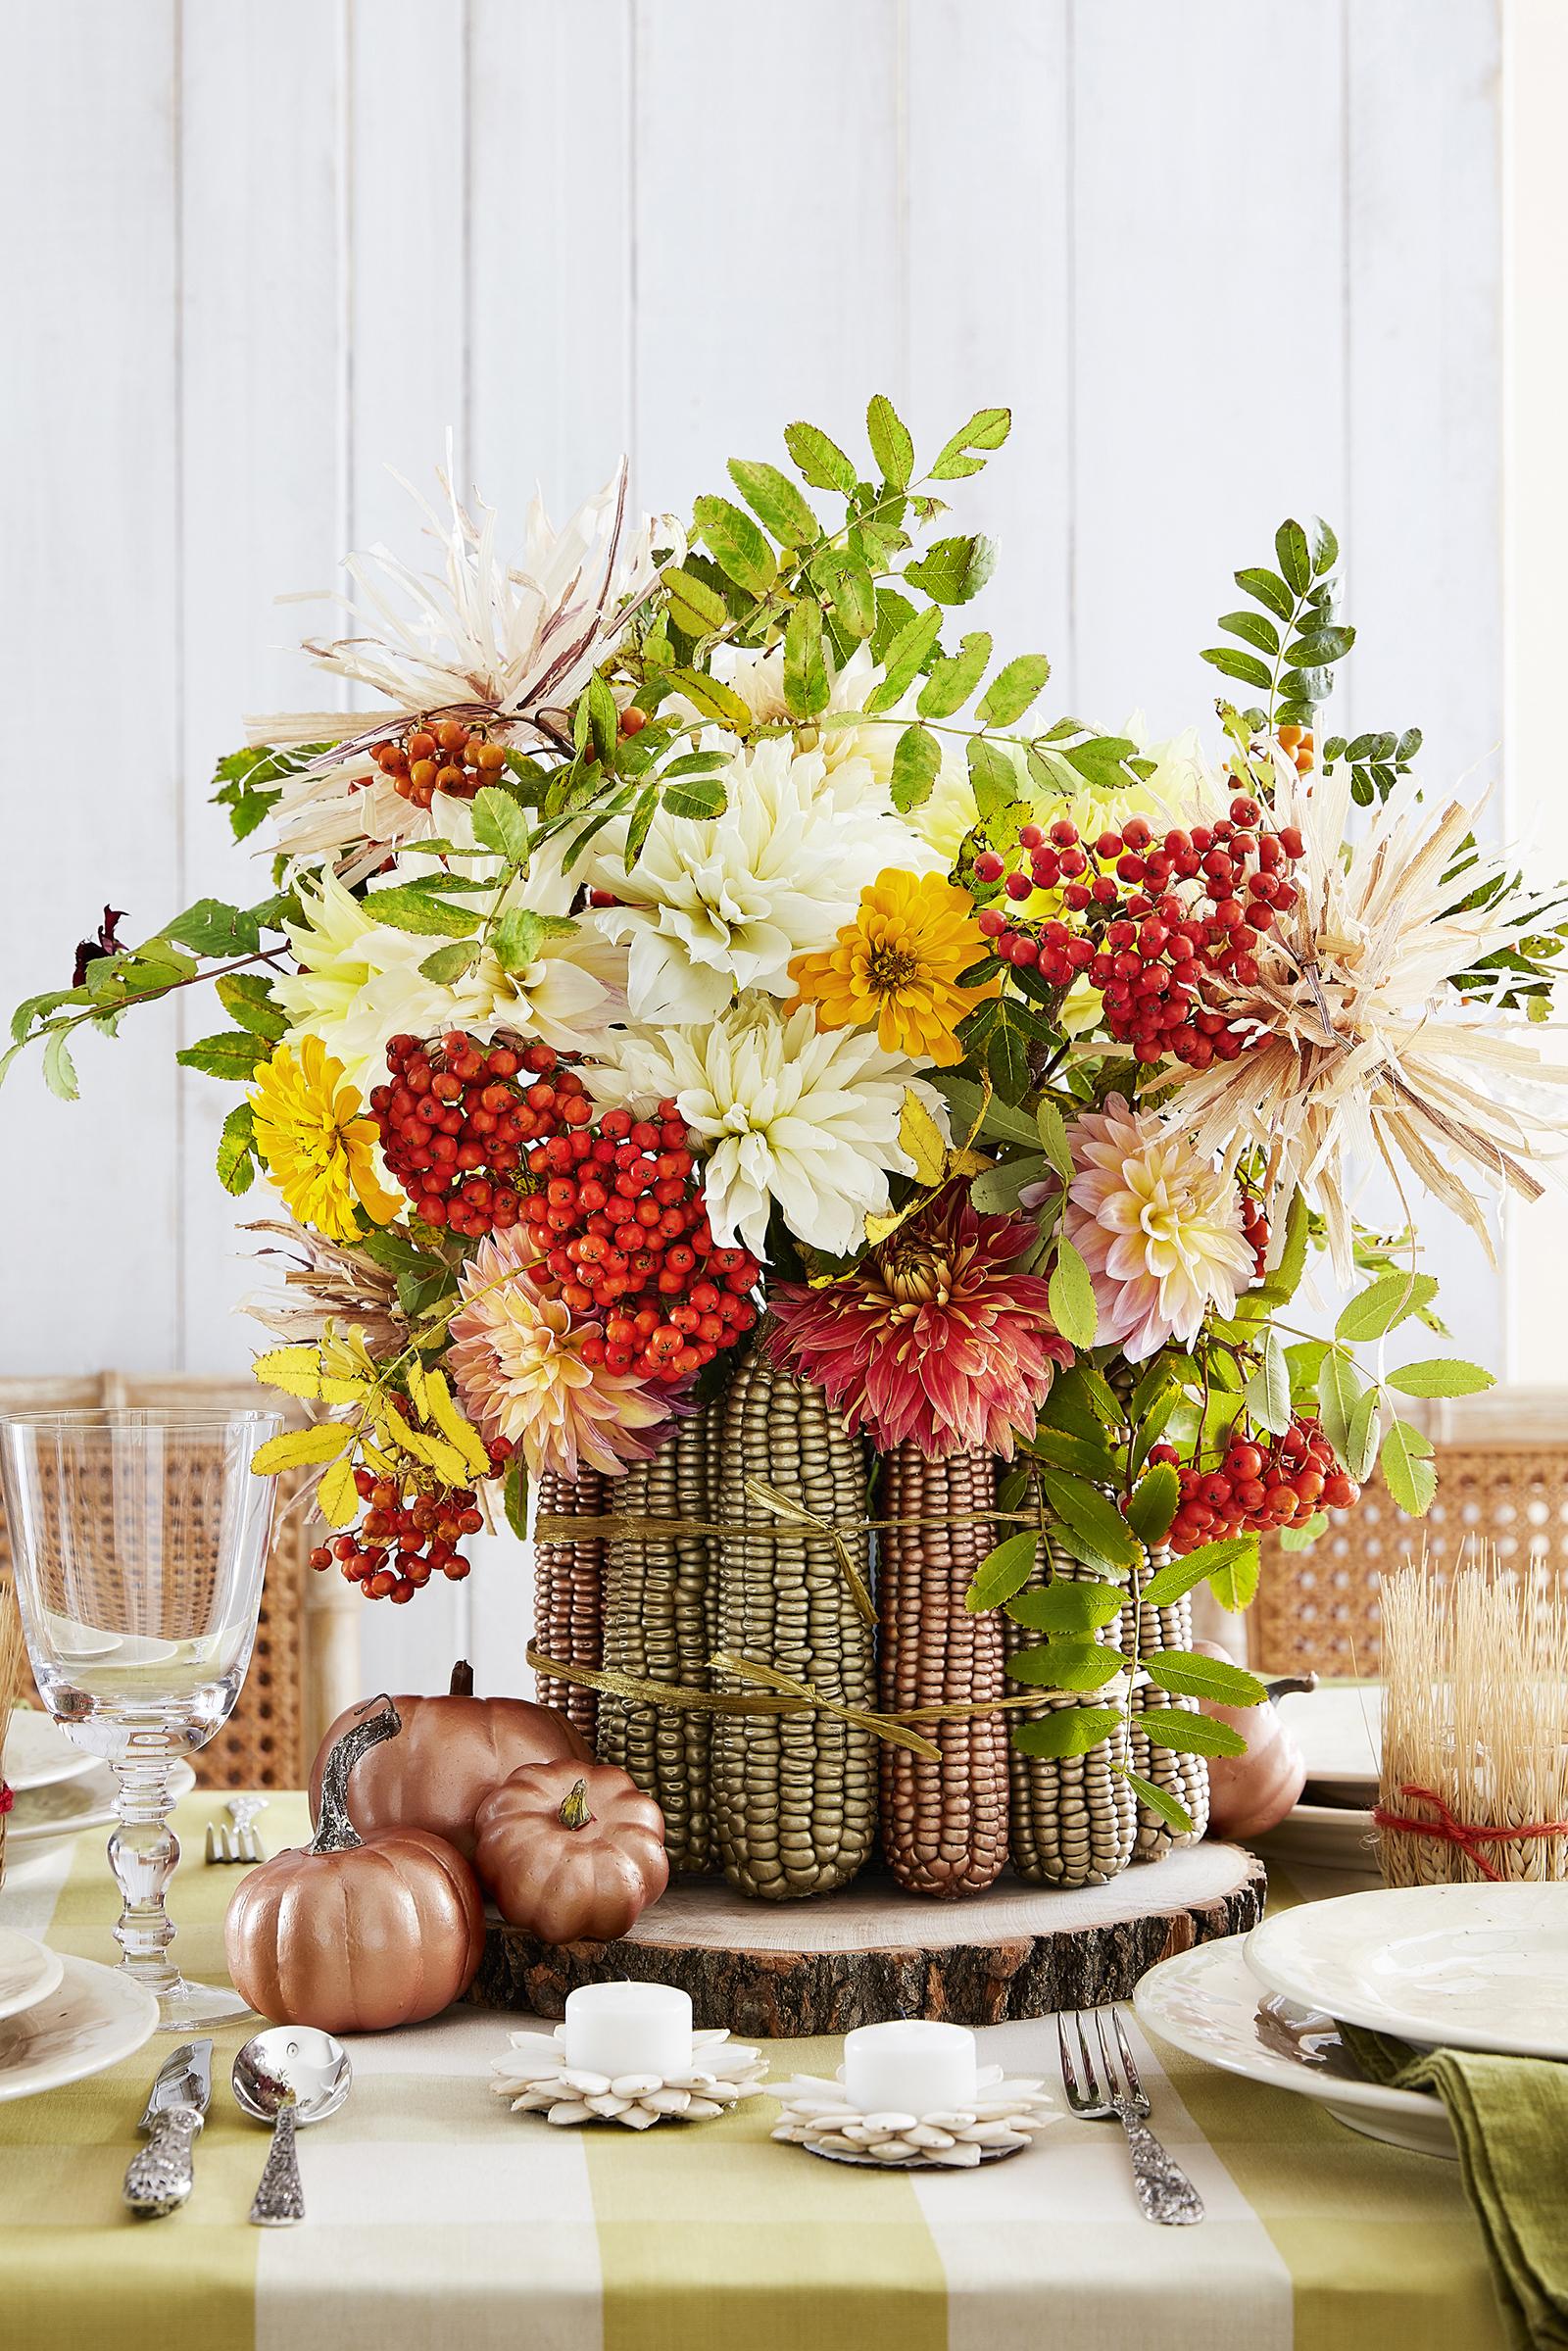 38 Fall Table Centerpieces - Autumn Centerpiece Ideas